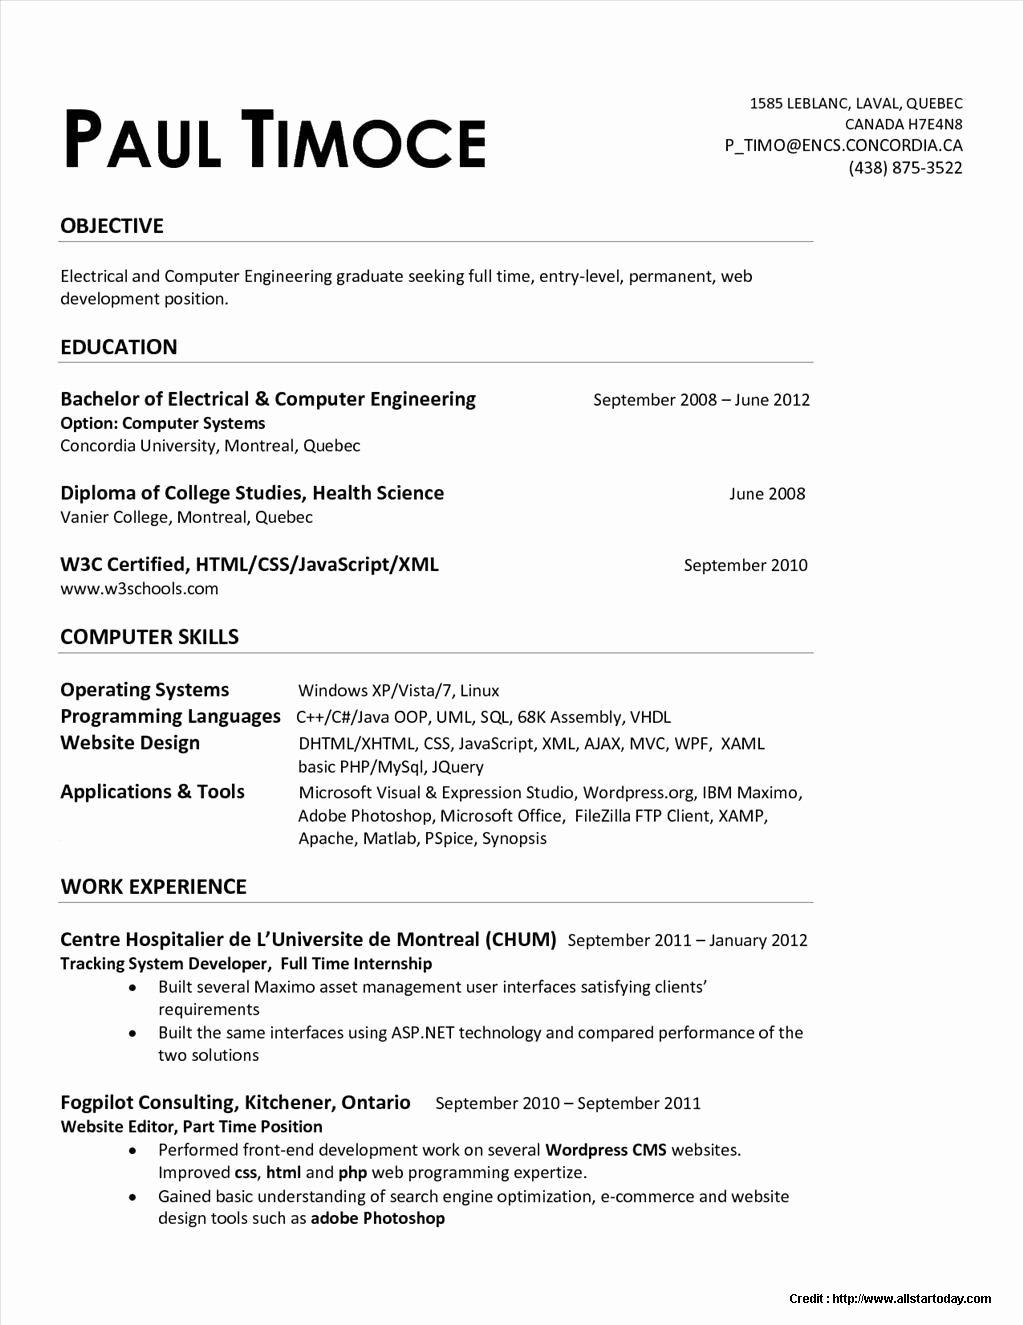 Entry Level Civil Engineer Resume Lovely Entry Level Mechanical Engineering Resume Electrical